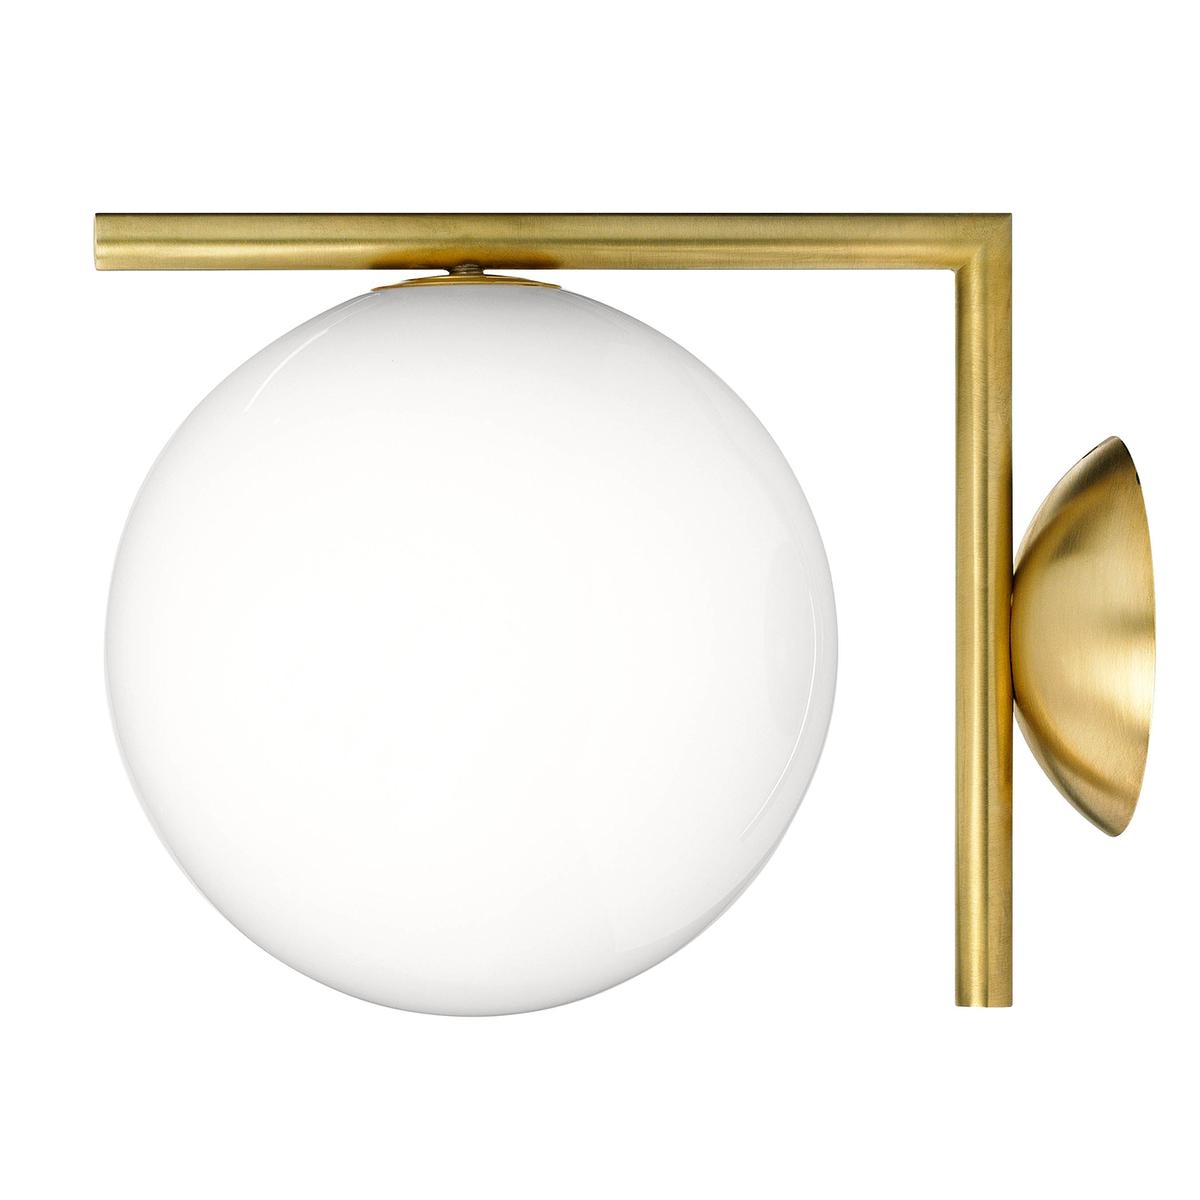 Royal Designs Decorative Lamp Shade Musical Notes Design Made in USA